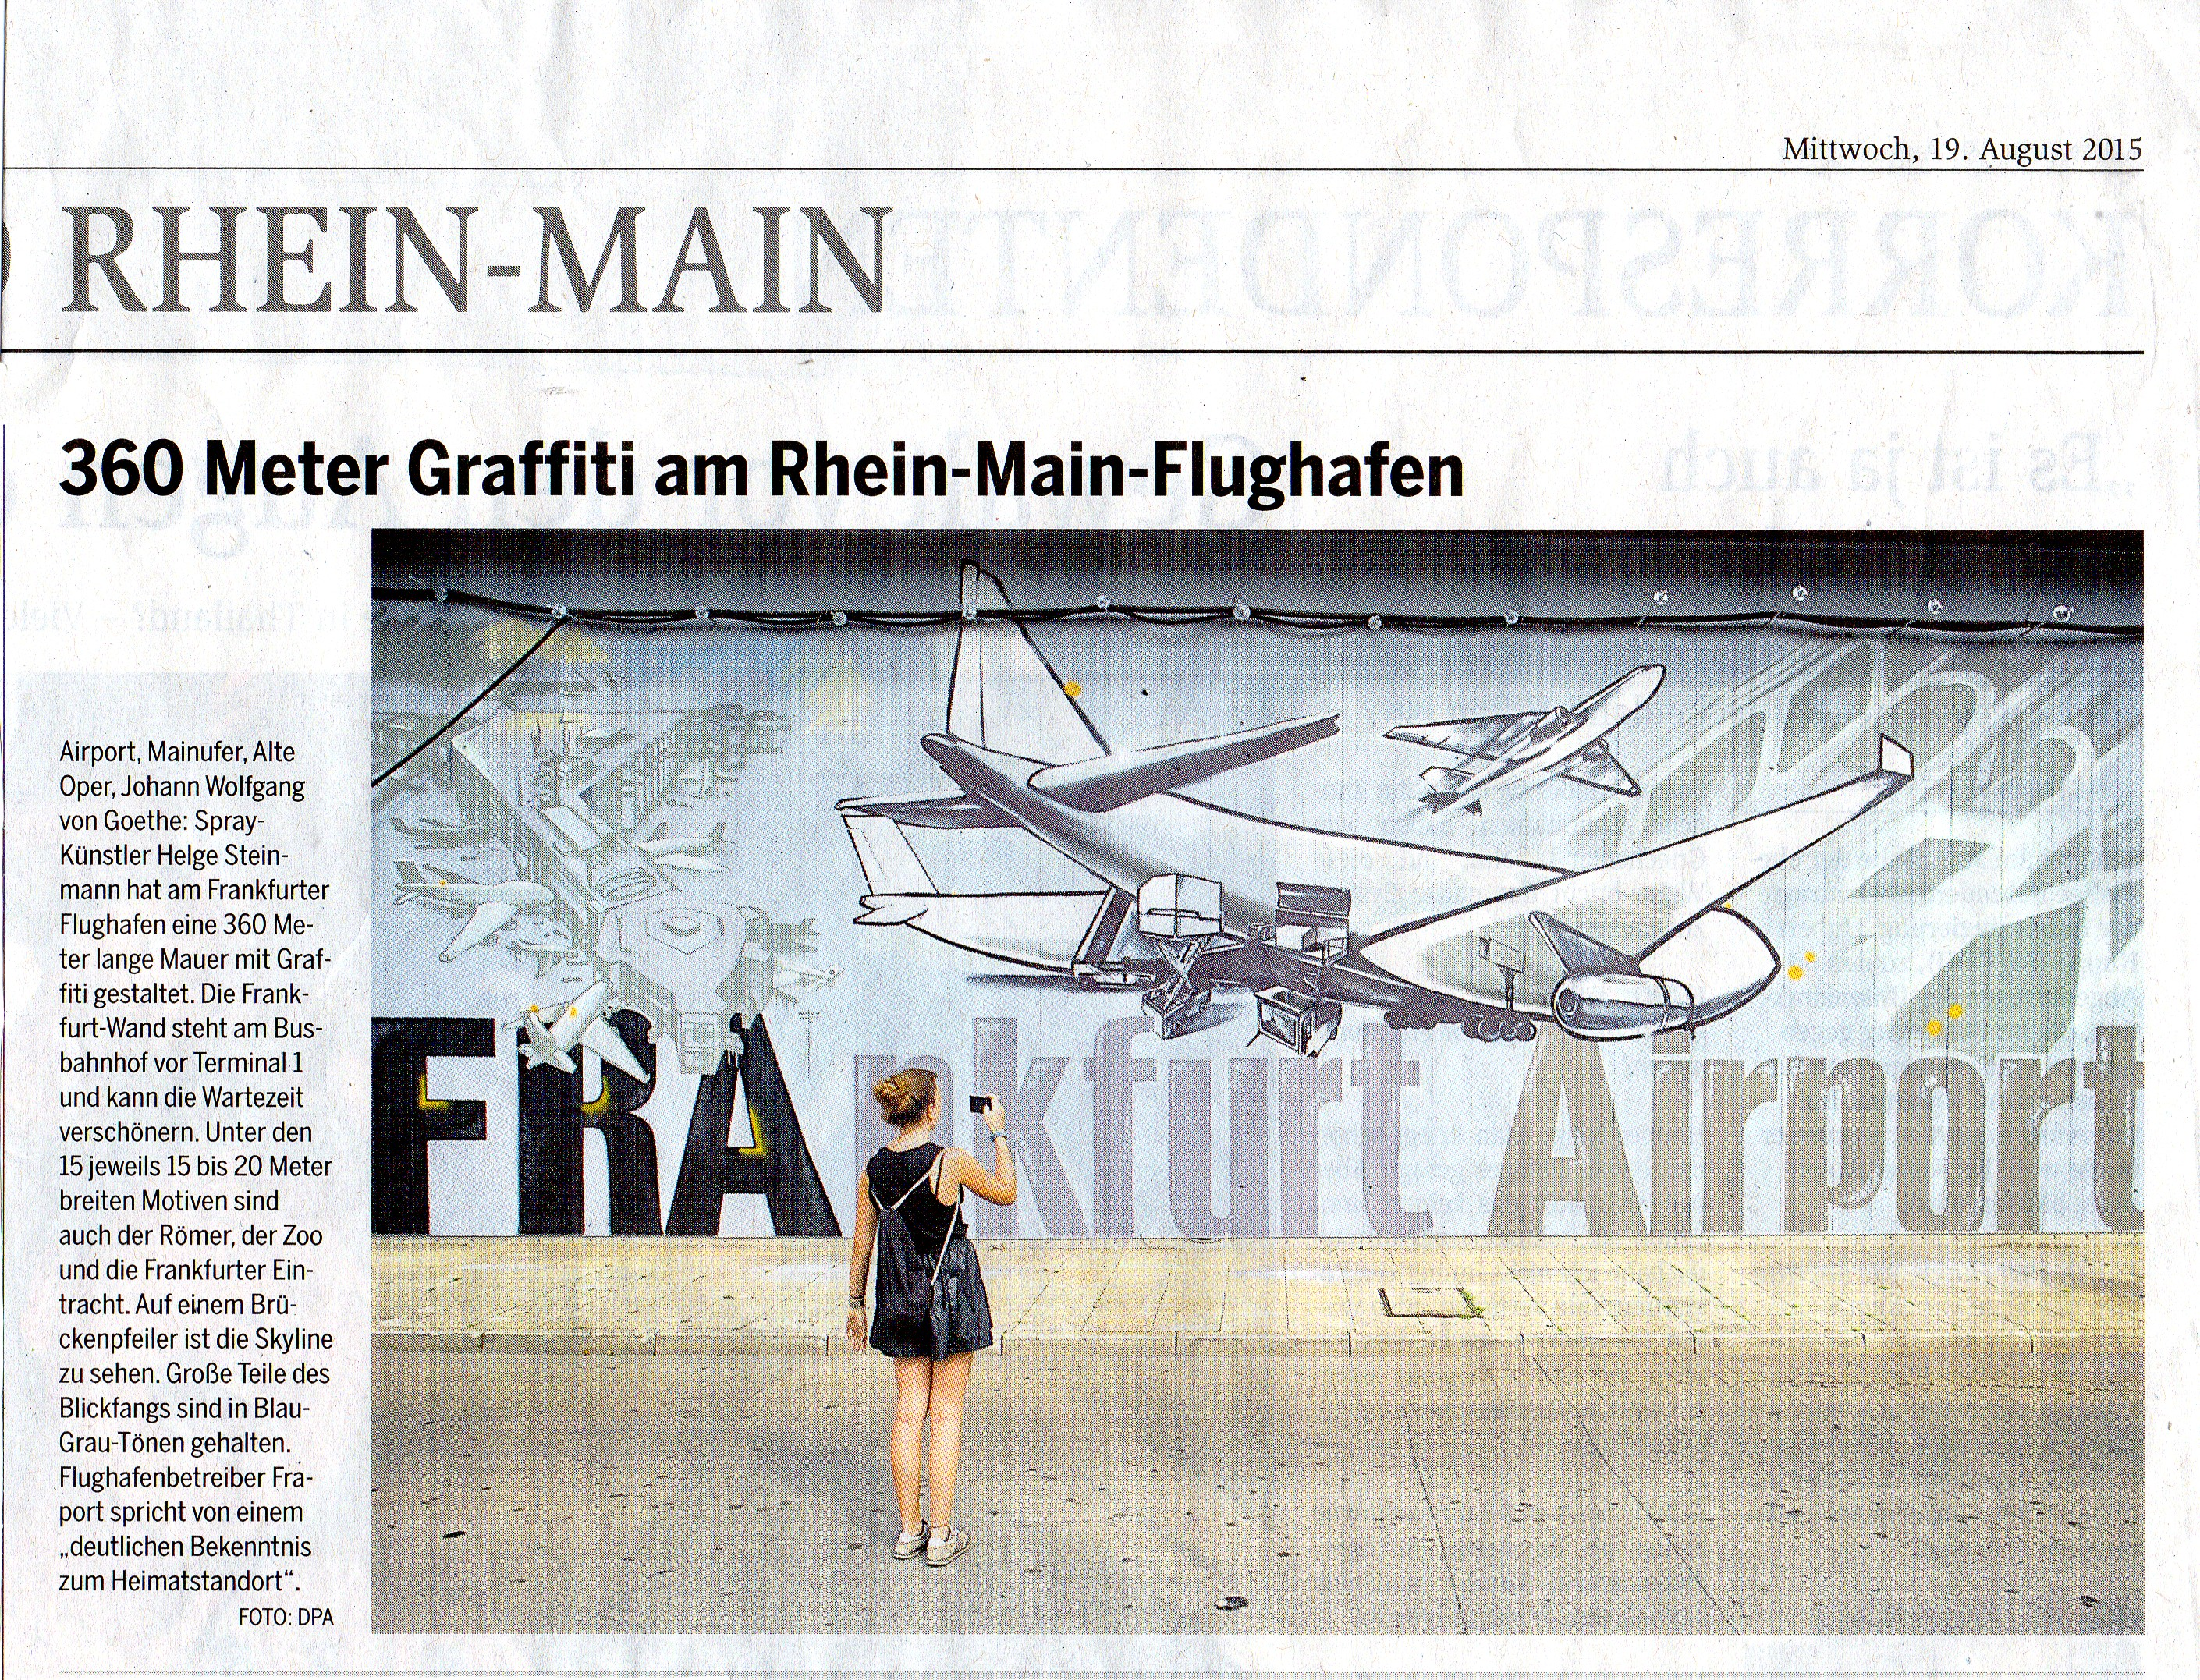 Bomber-Da-Echo-Hessen-und-RheinMain-19.8.2015